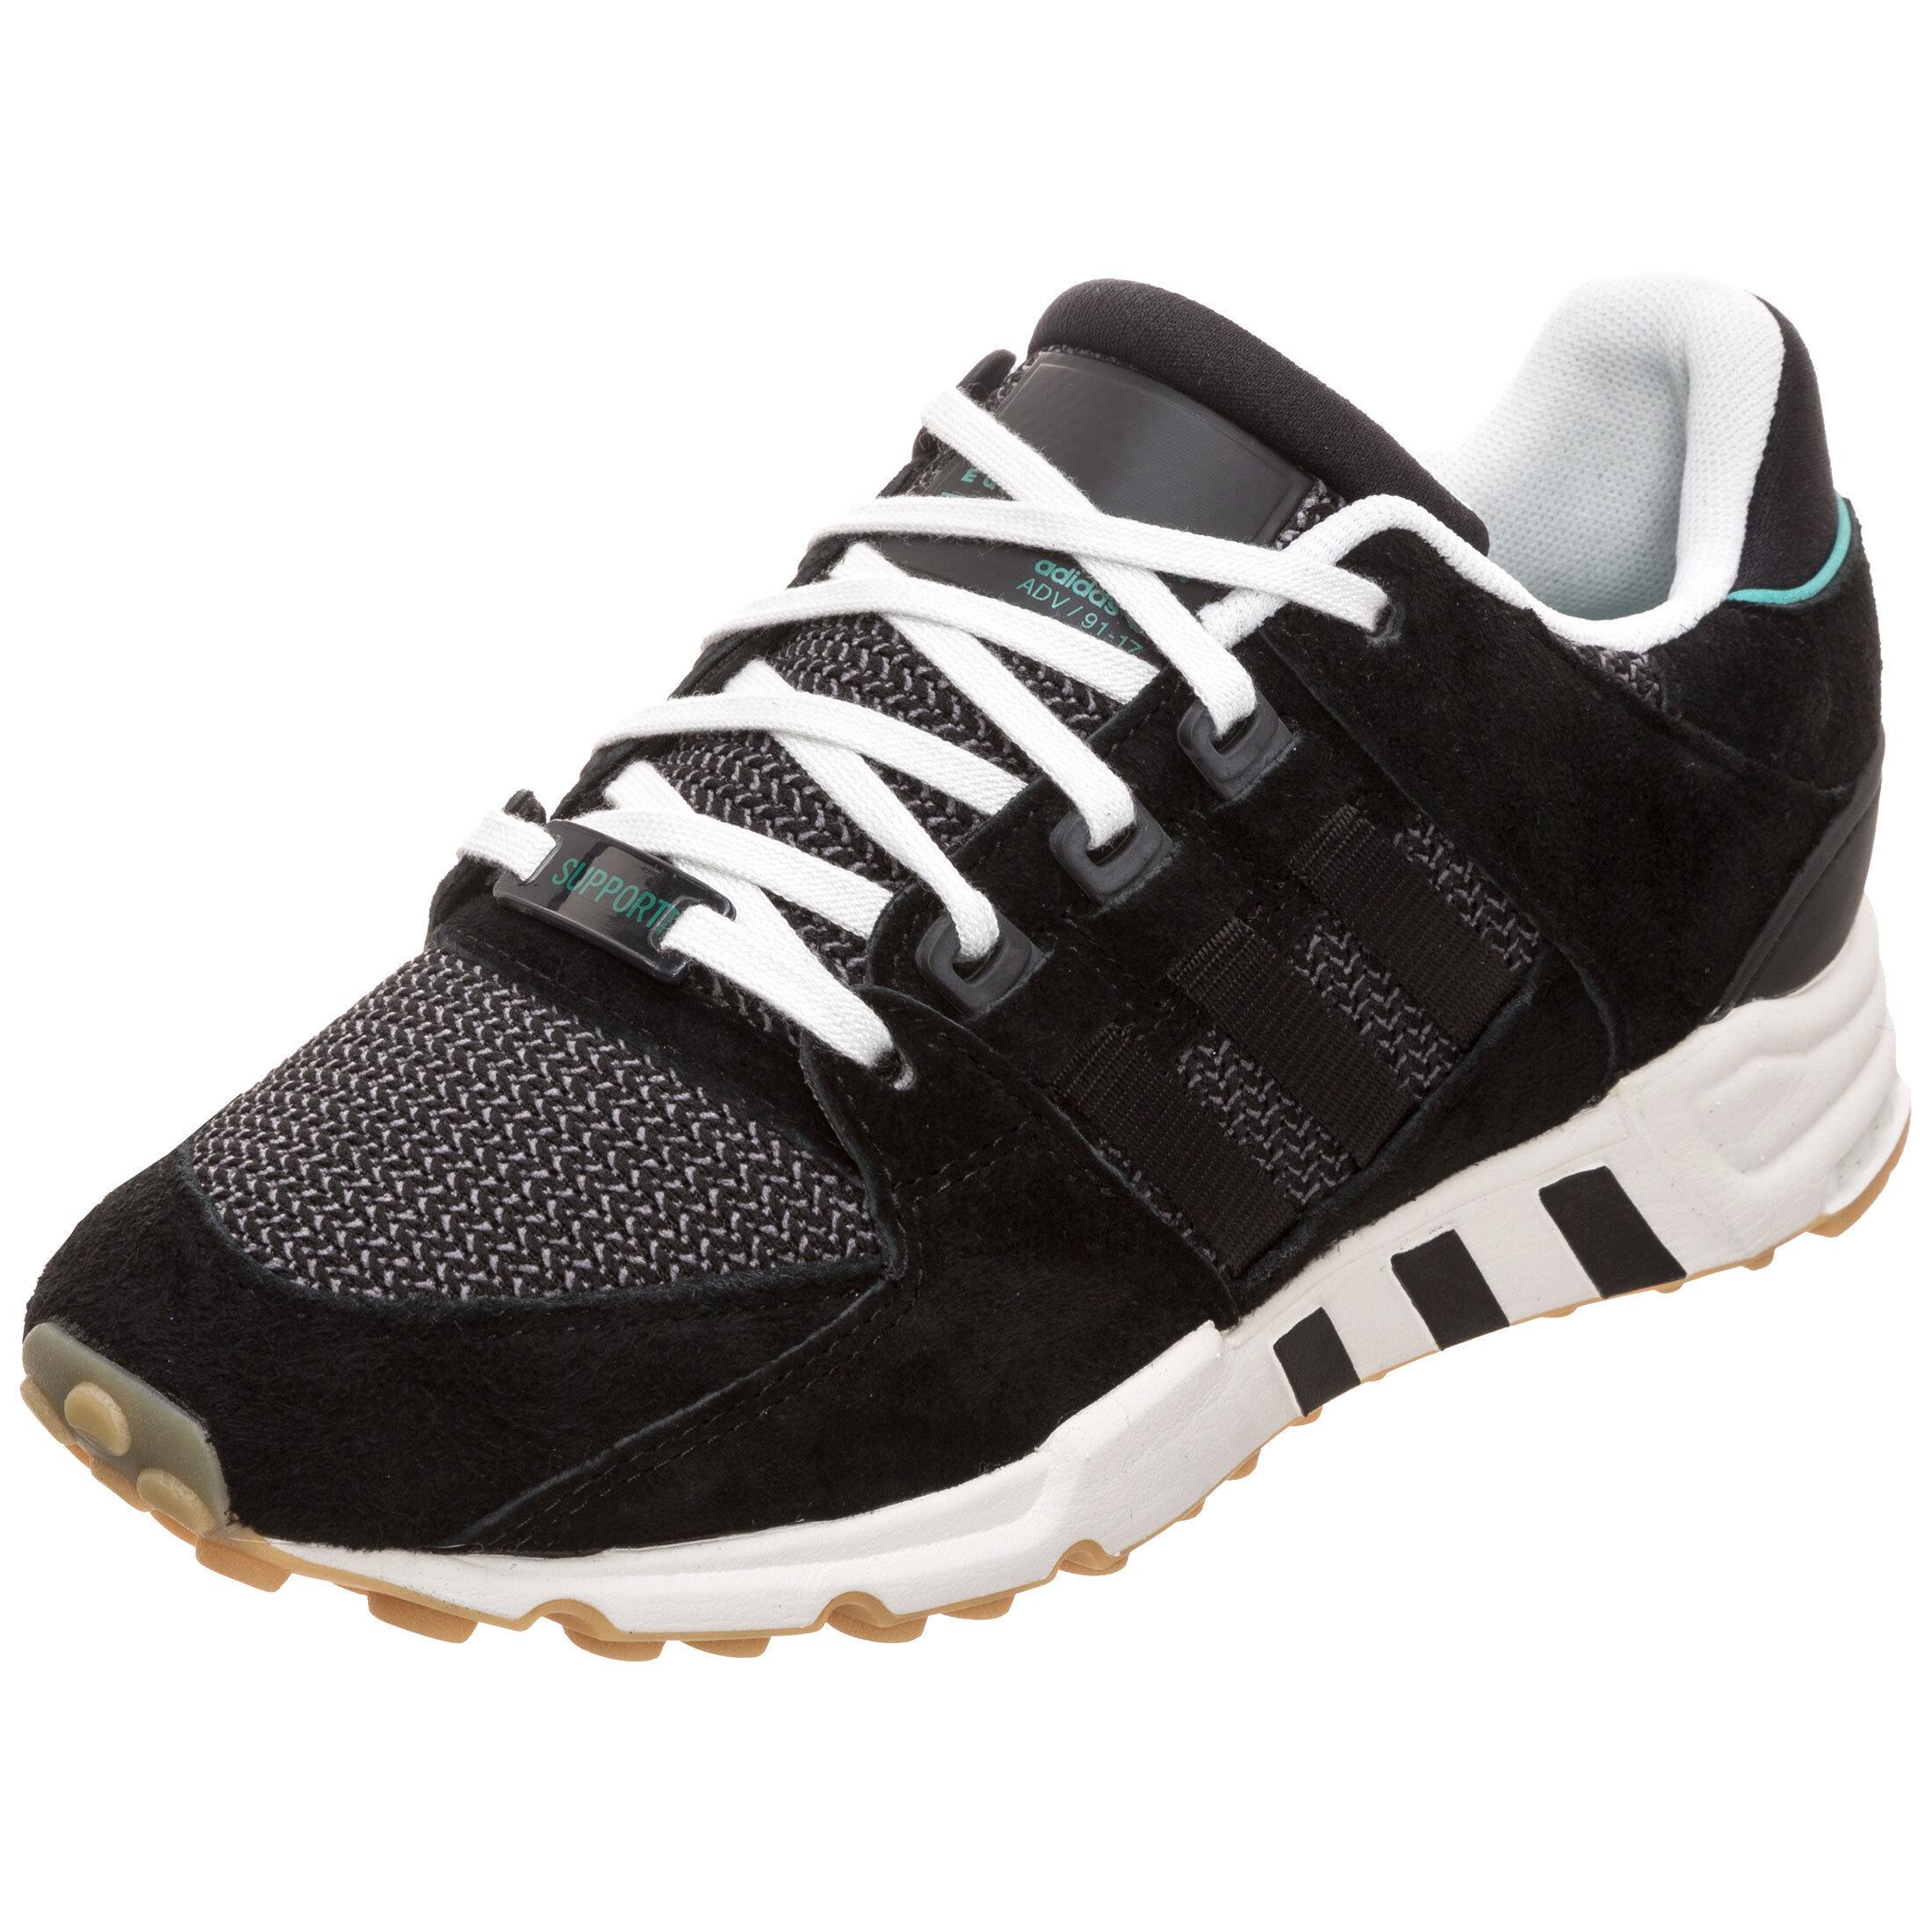 Adidas Originals ShopBei Adidas Adidas Originals Originals Outfitter ShopBei ShopBei Outfitter ED9Y2beWHI